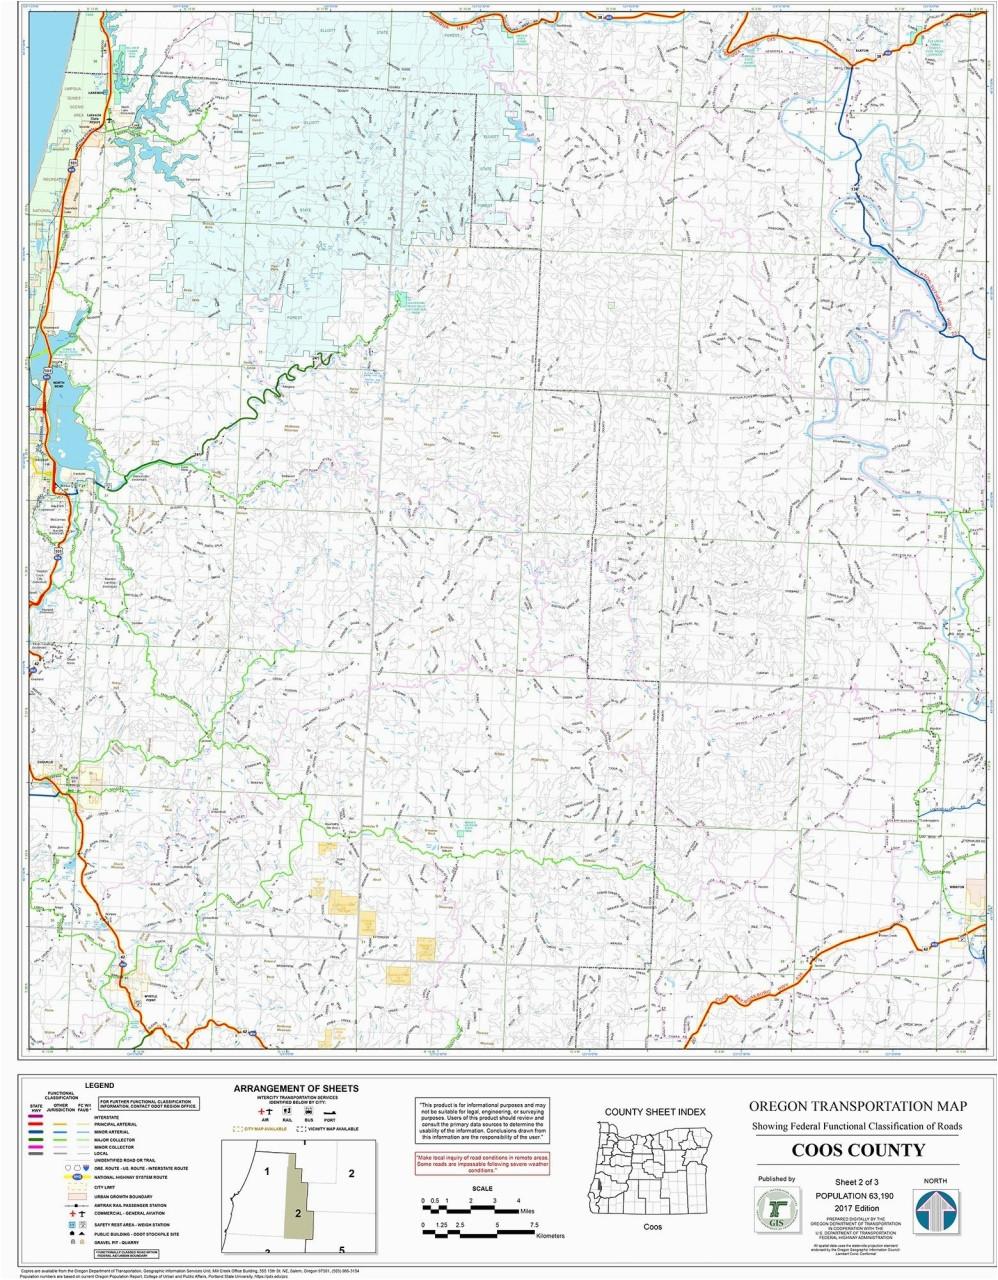 Dublin Ireland Google Maps Drake Nd Zip Code Google Maps New Mexico Maps Driving Directions